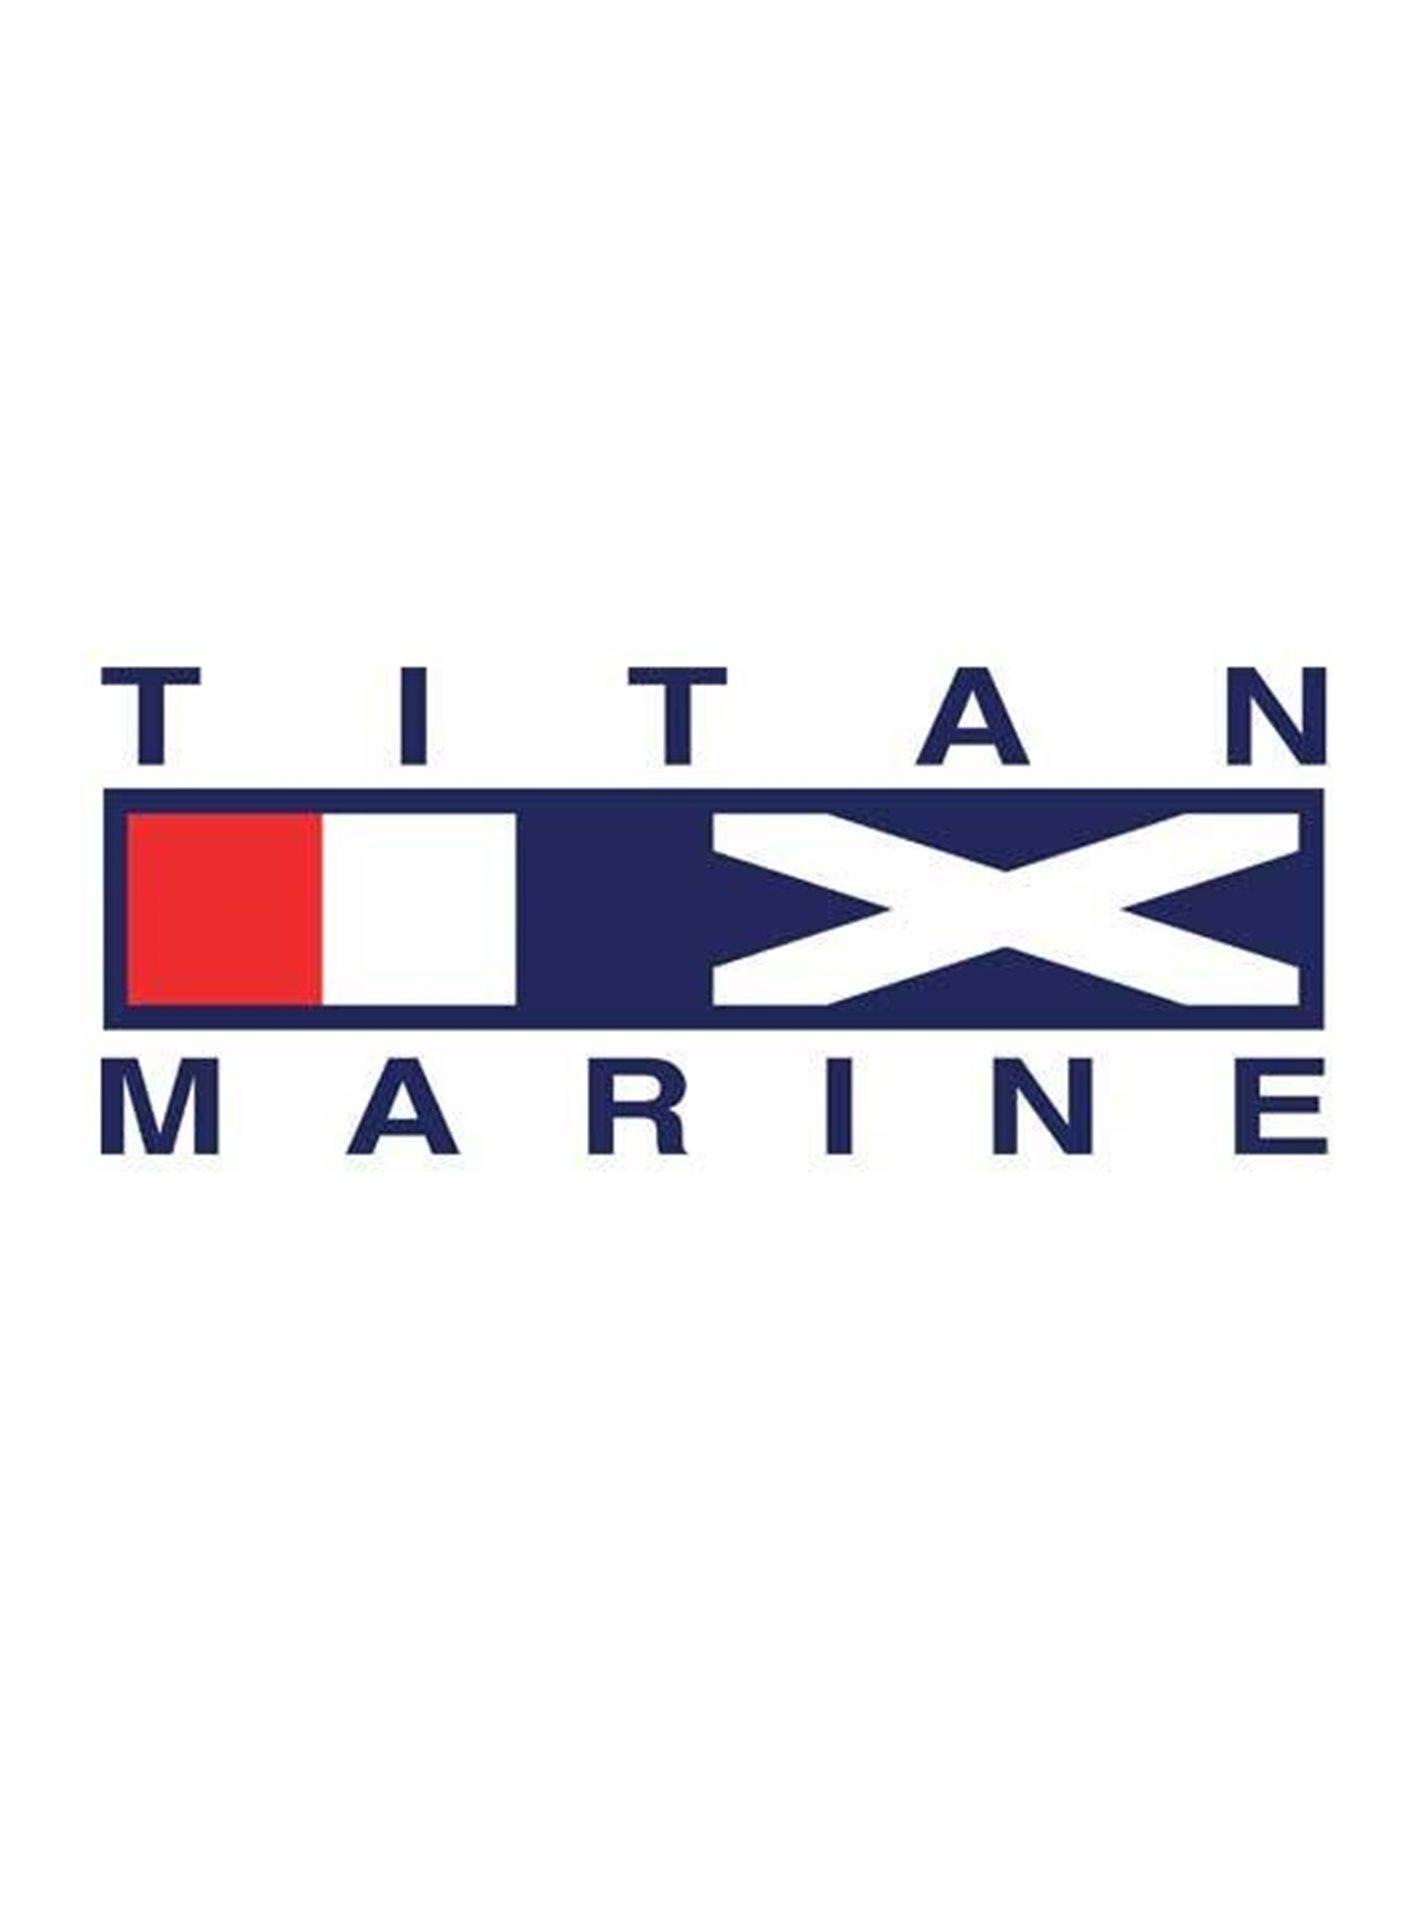 Logo Titan Marine